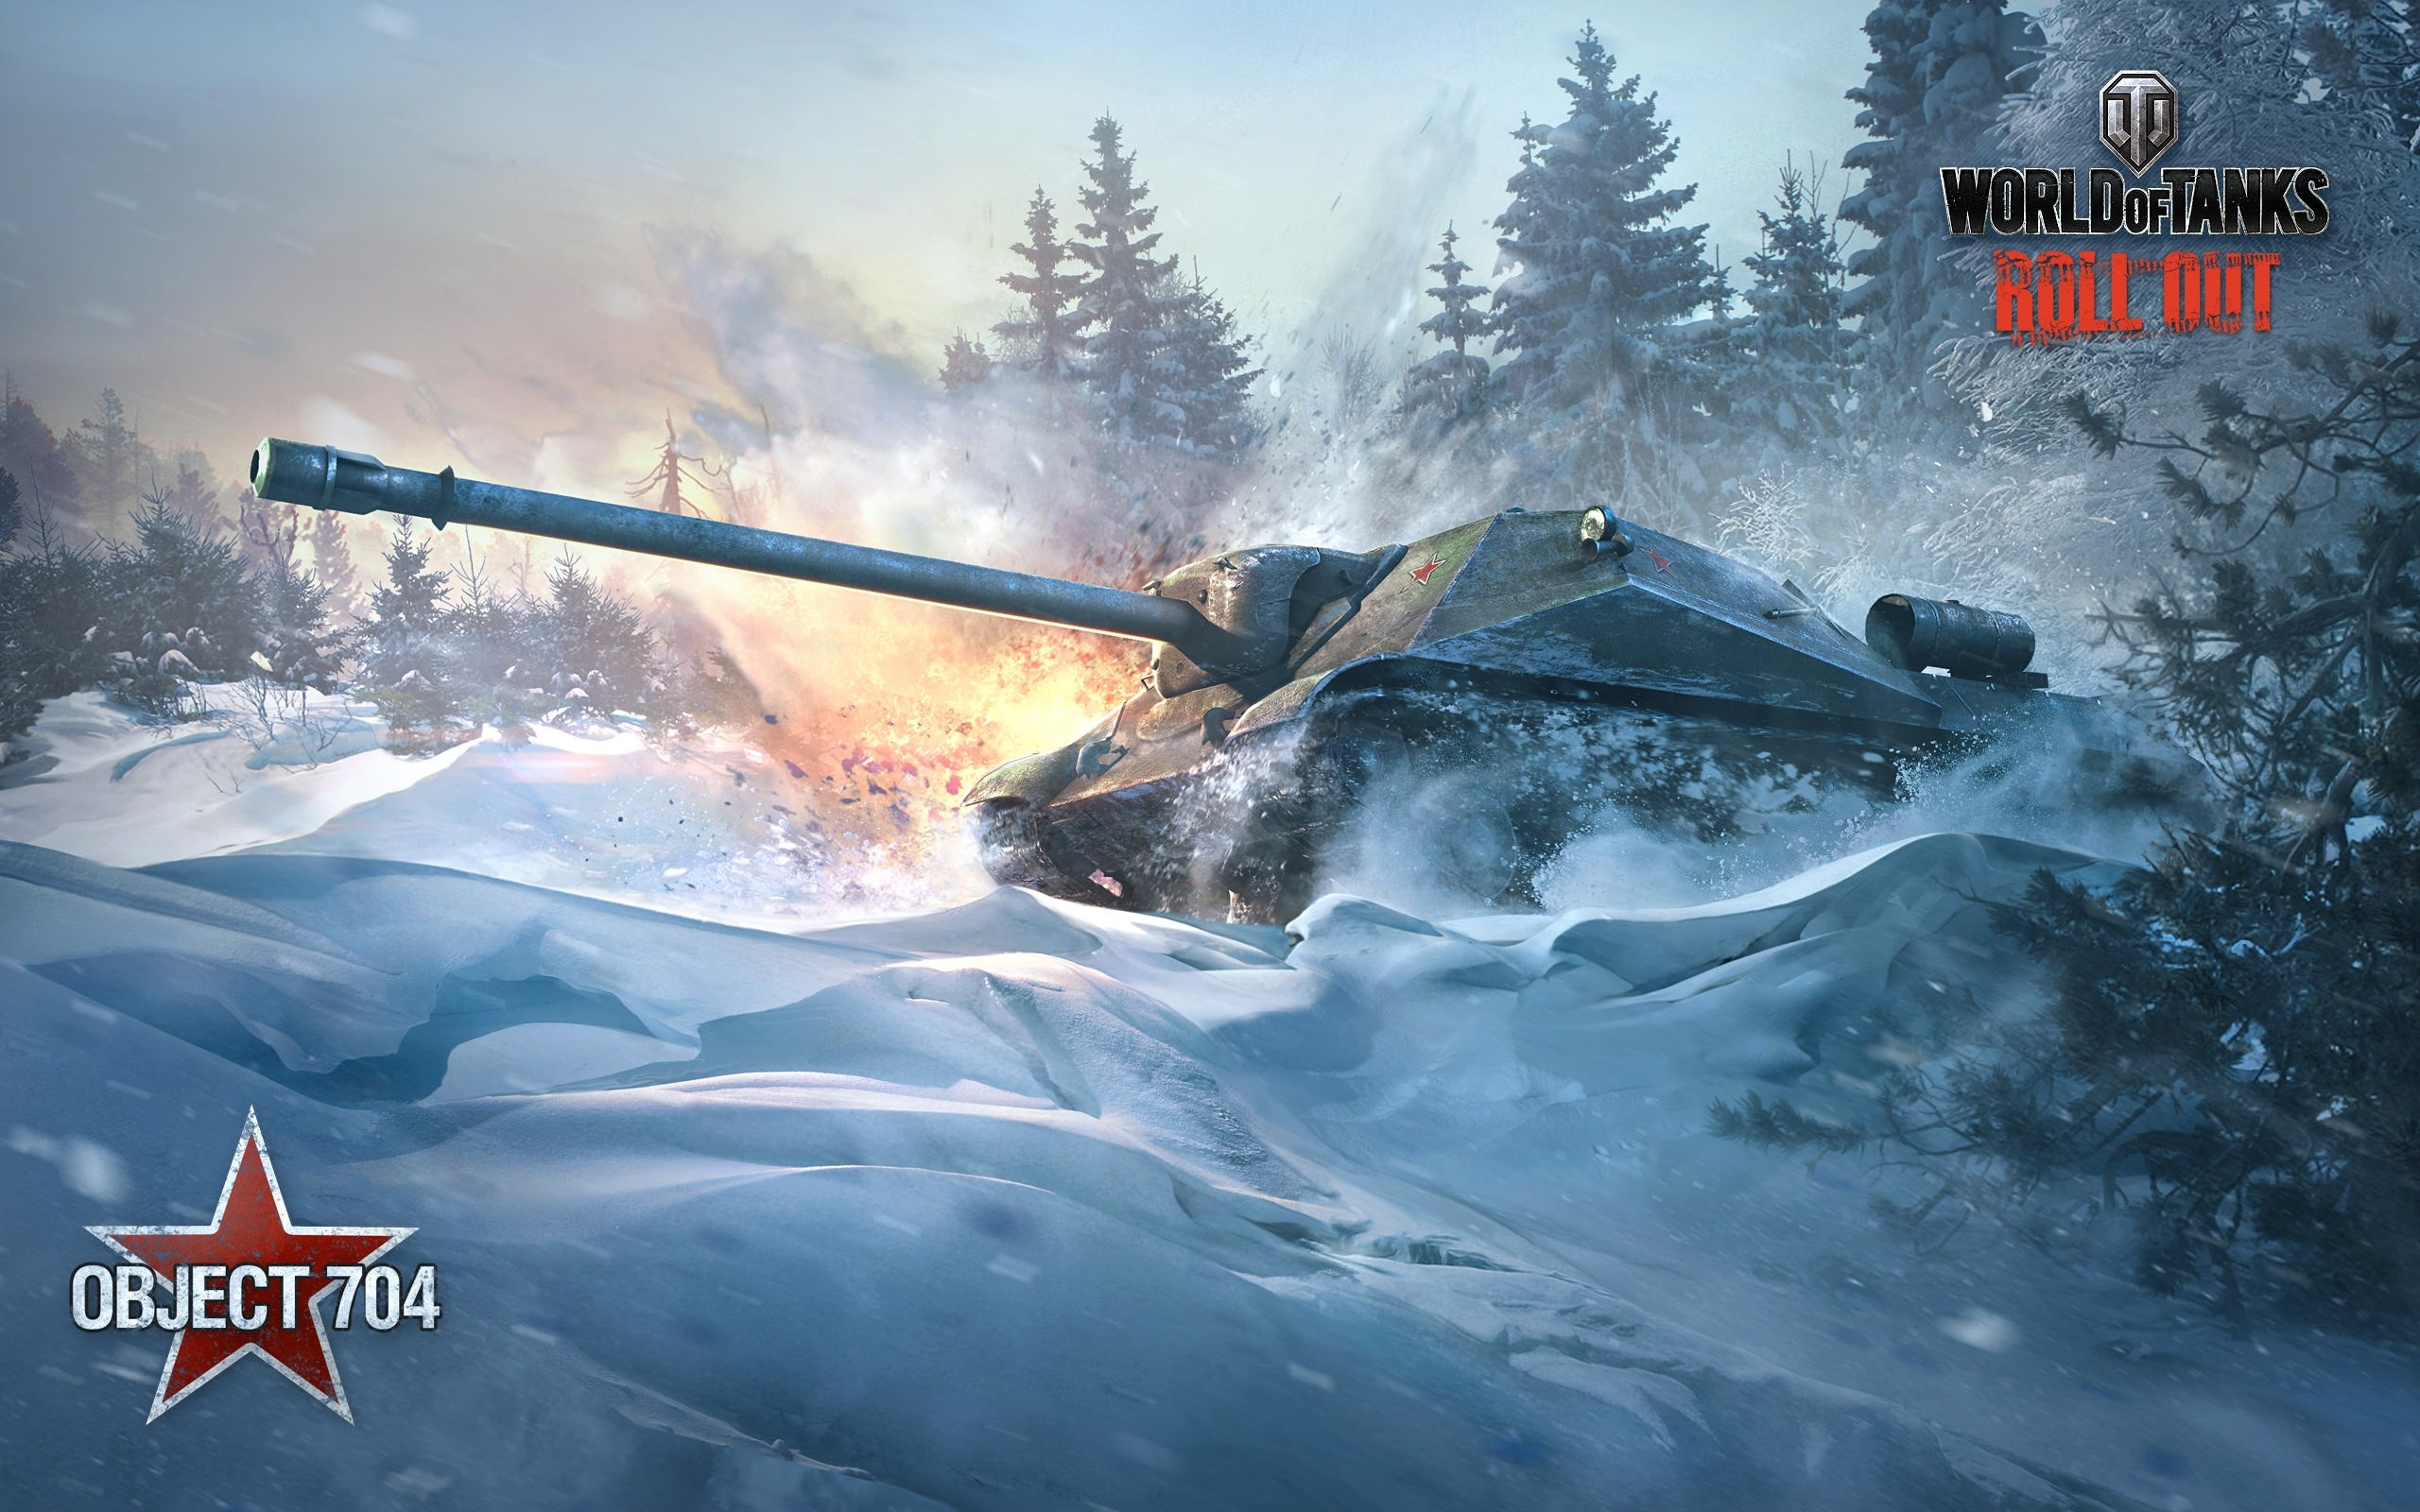 Wallpaper Object 704 World of tanks